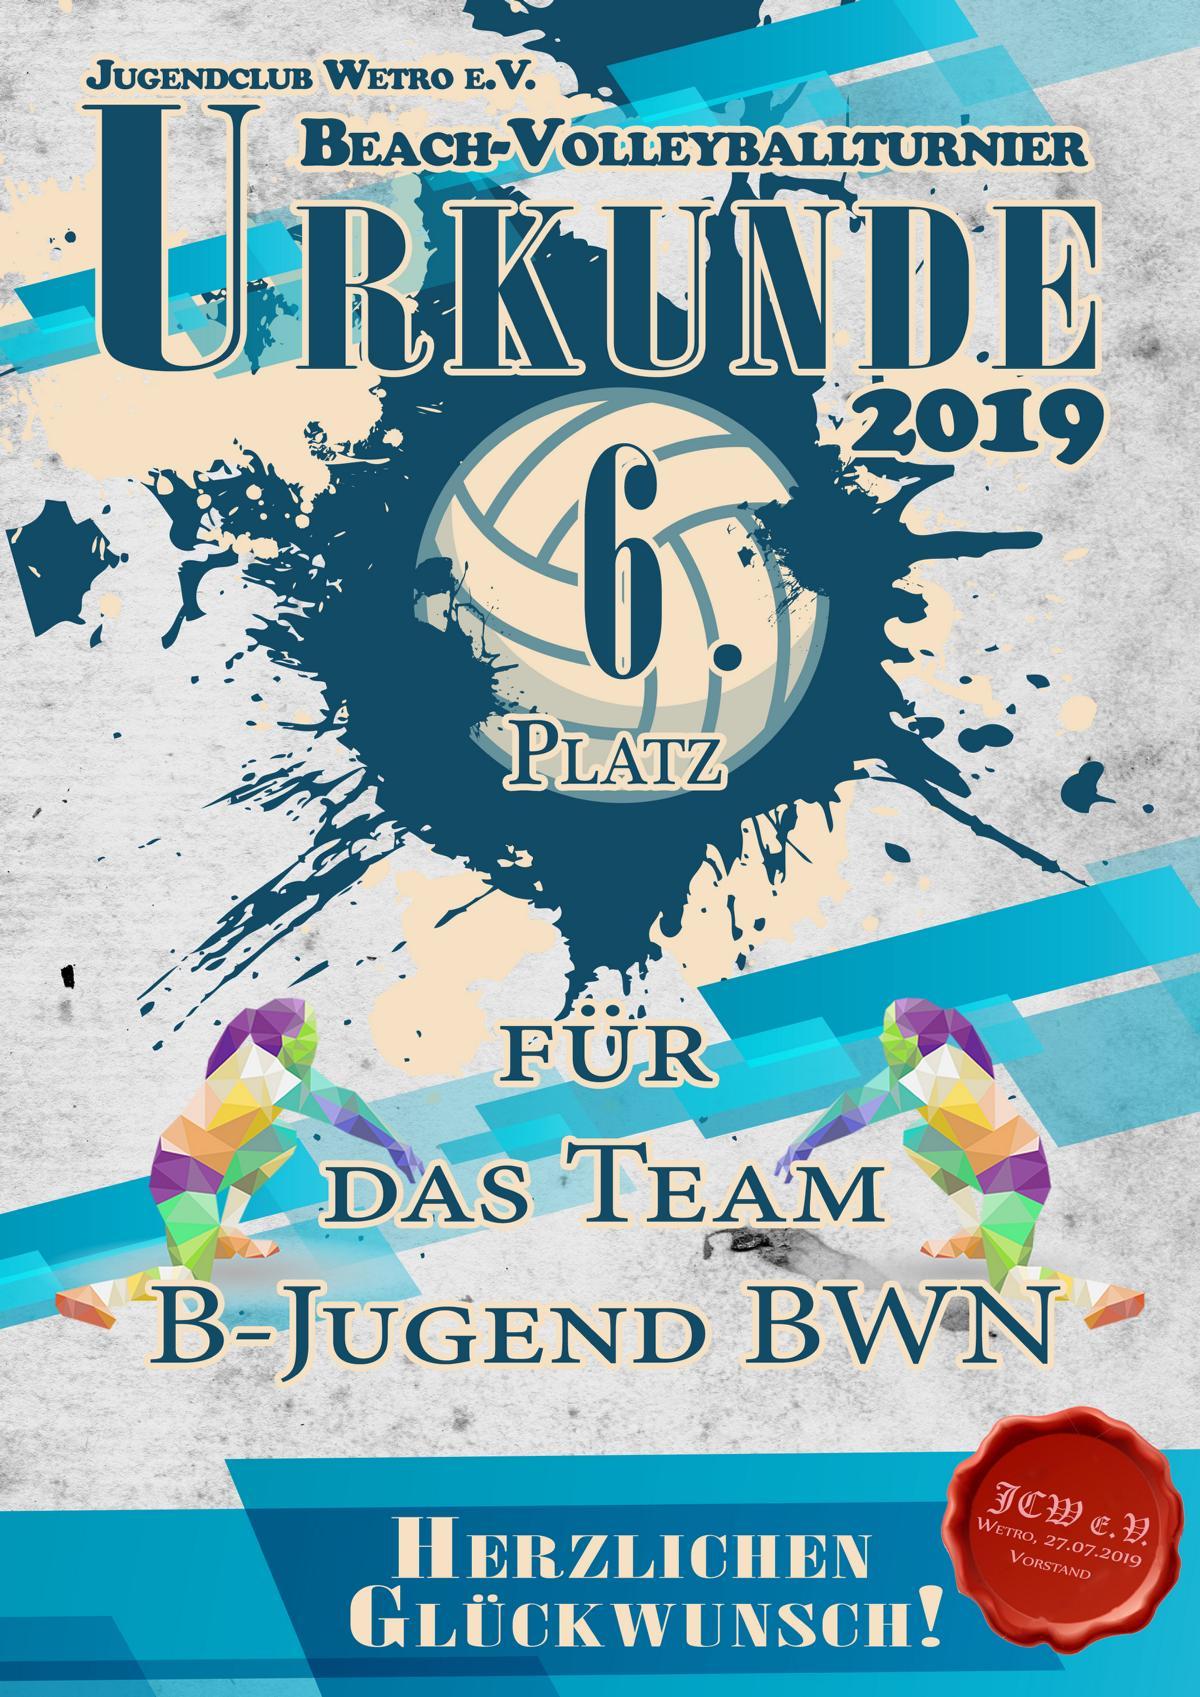 http://www.jugendclub-wetro.de/wp-content/uploads/2019/07/06_VBT2k19_BJ.jpg